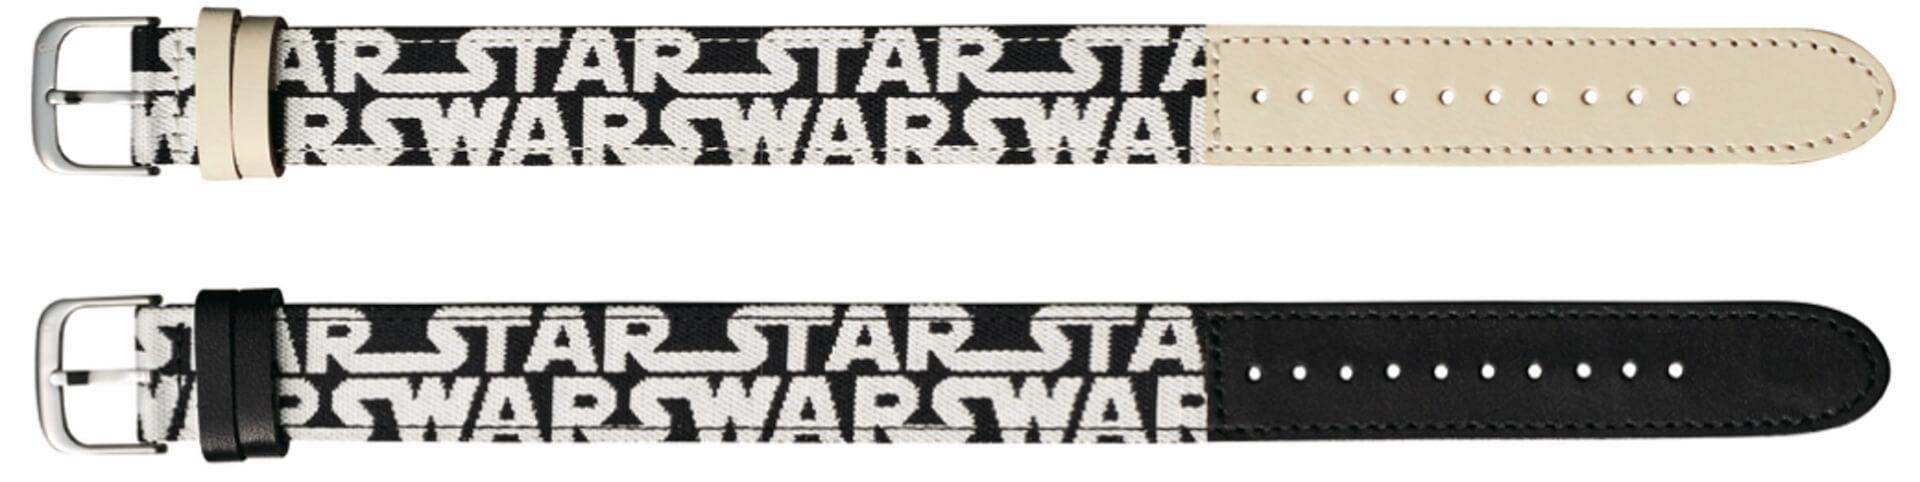 Knotから『スター・ウォーズ/スカイウォーカーの夜明け』公開記念ウォッチコレクションが限定発売! life191024_starwars_watch_16